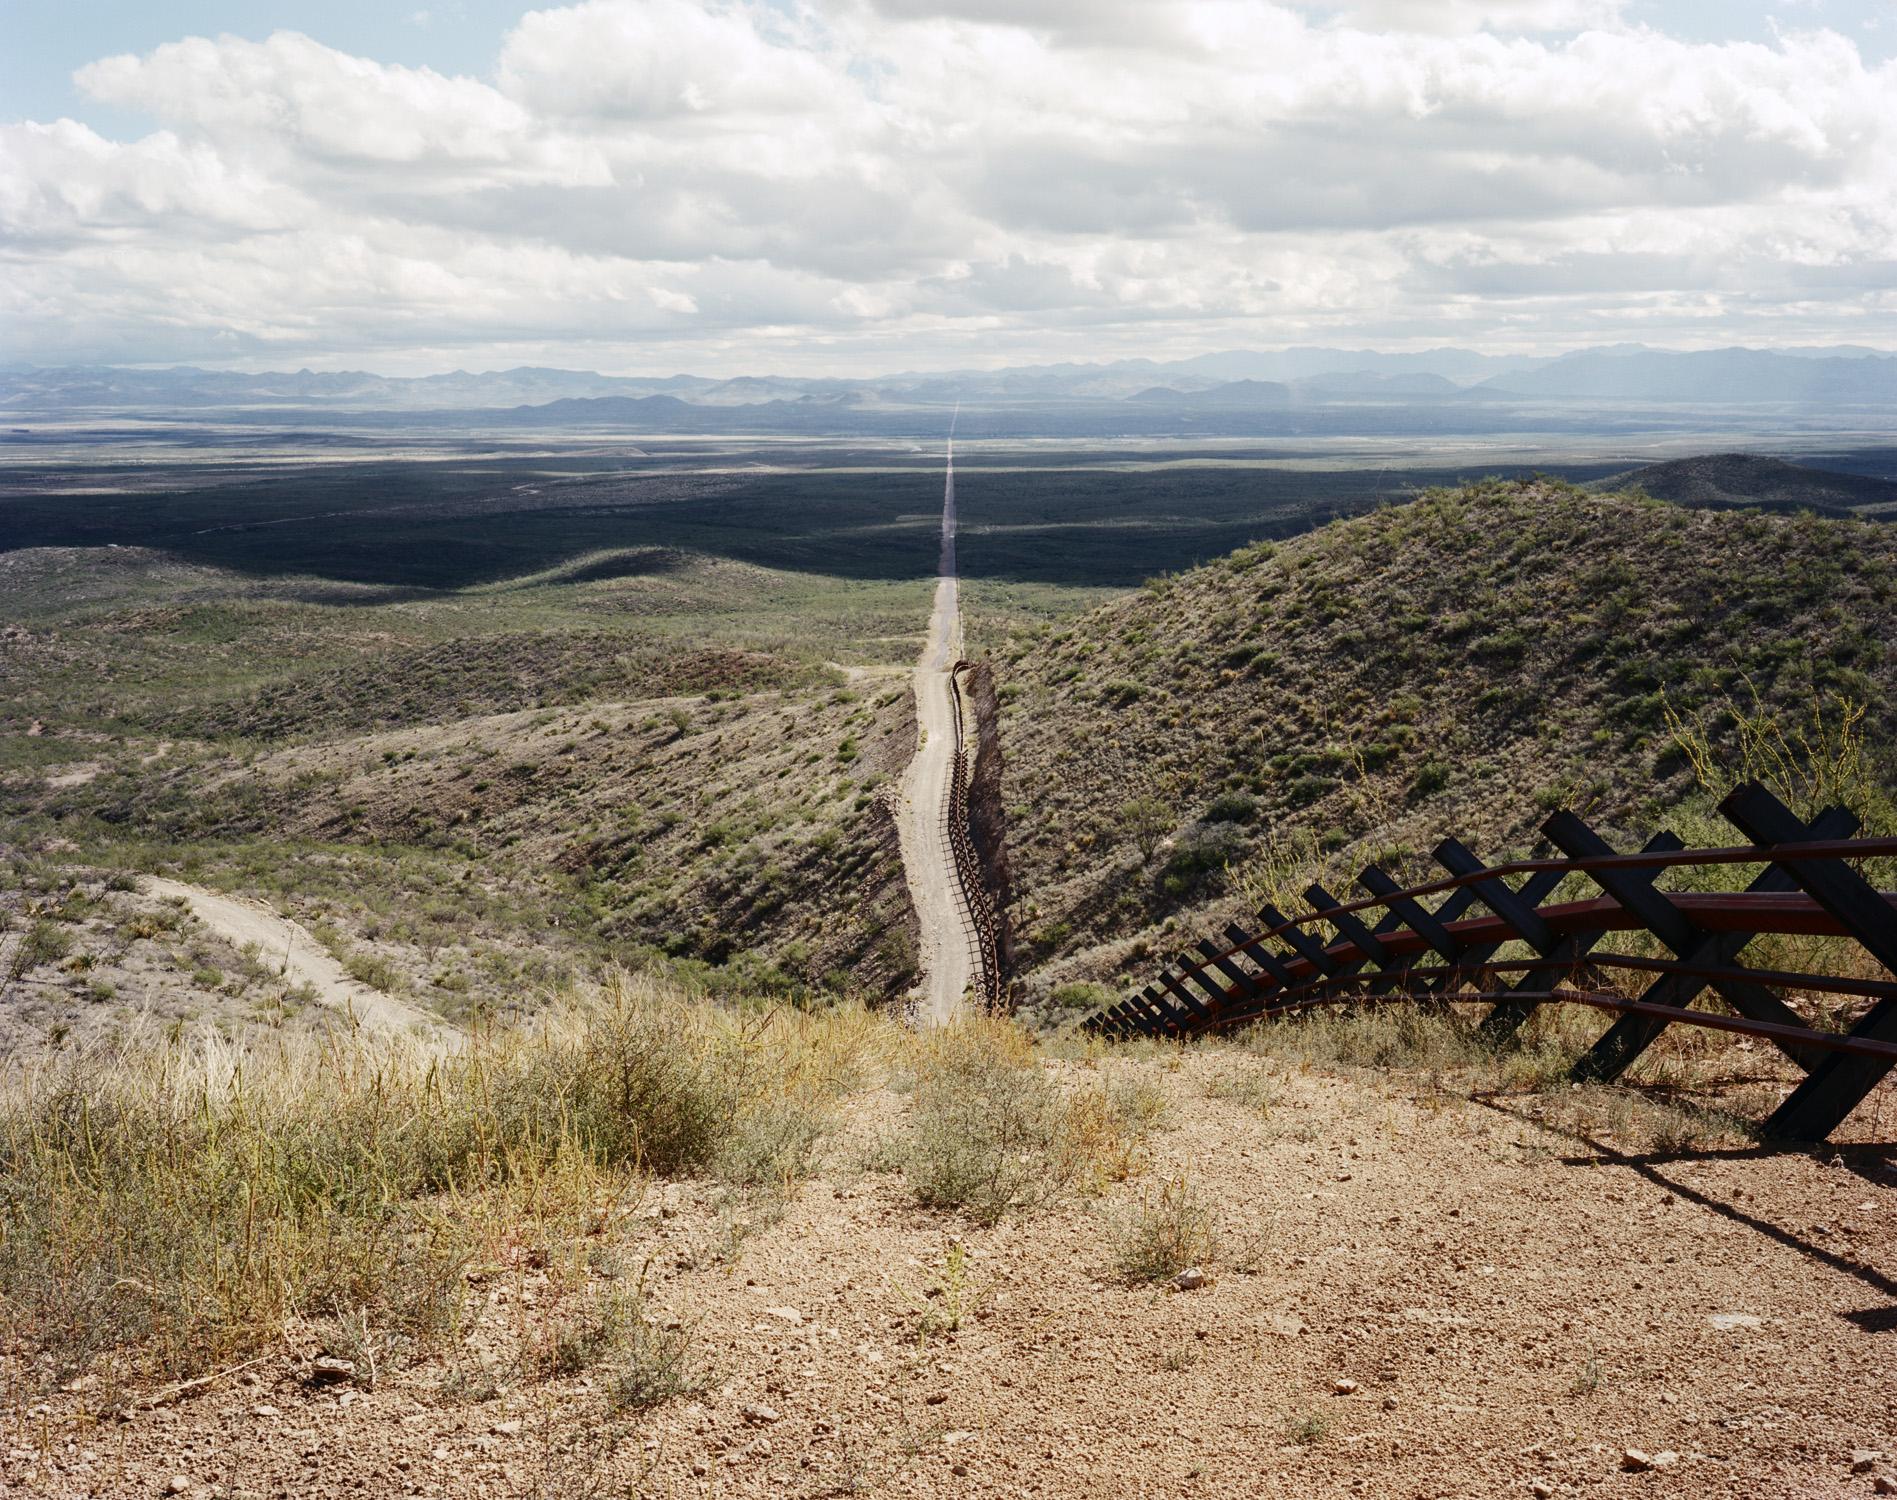 U.S.-Mexico Border, Near Douglas, Arizona